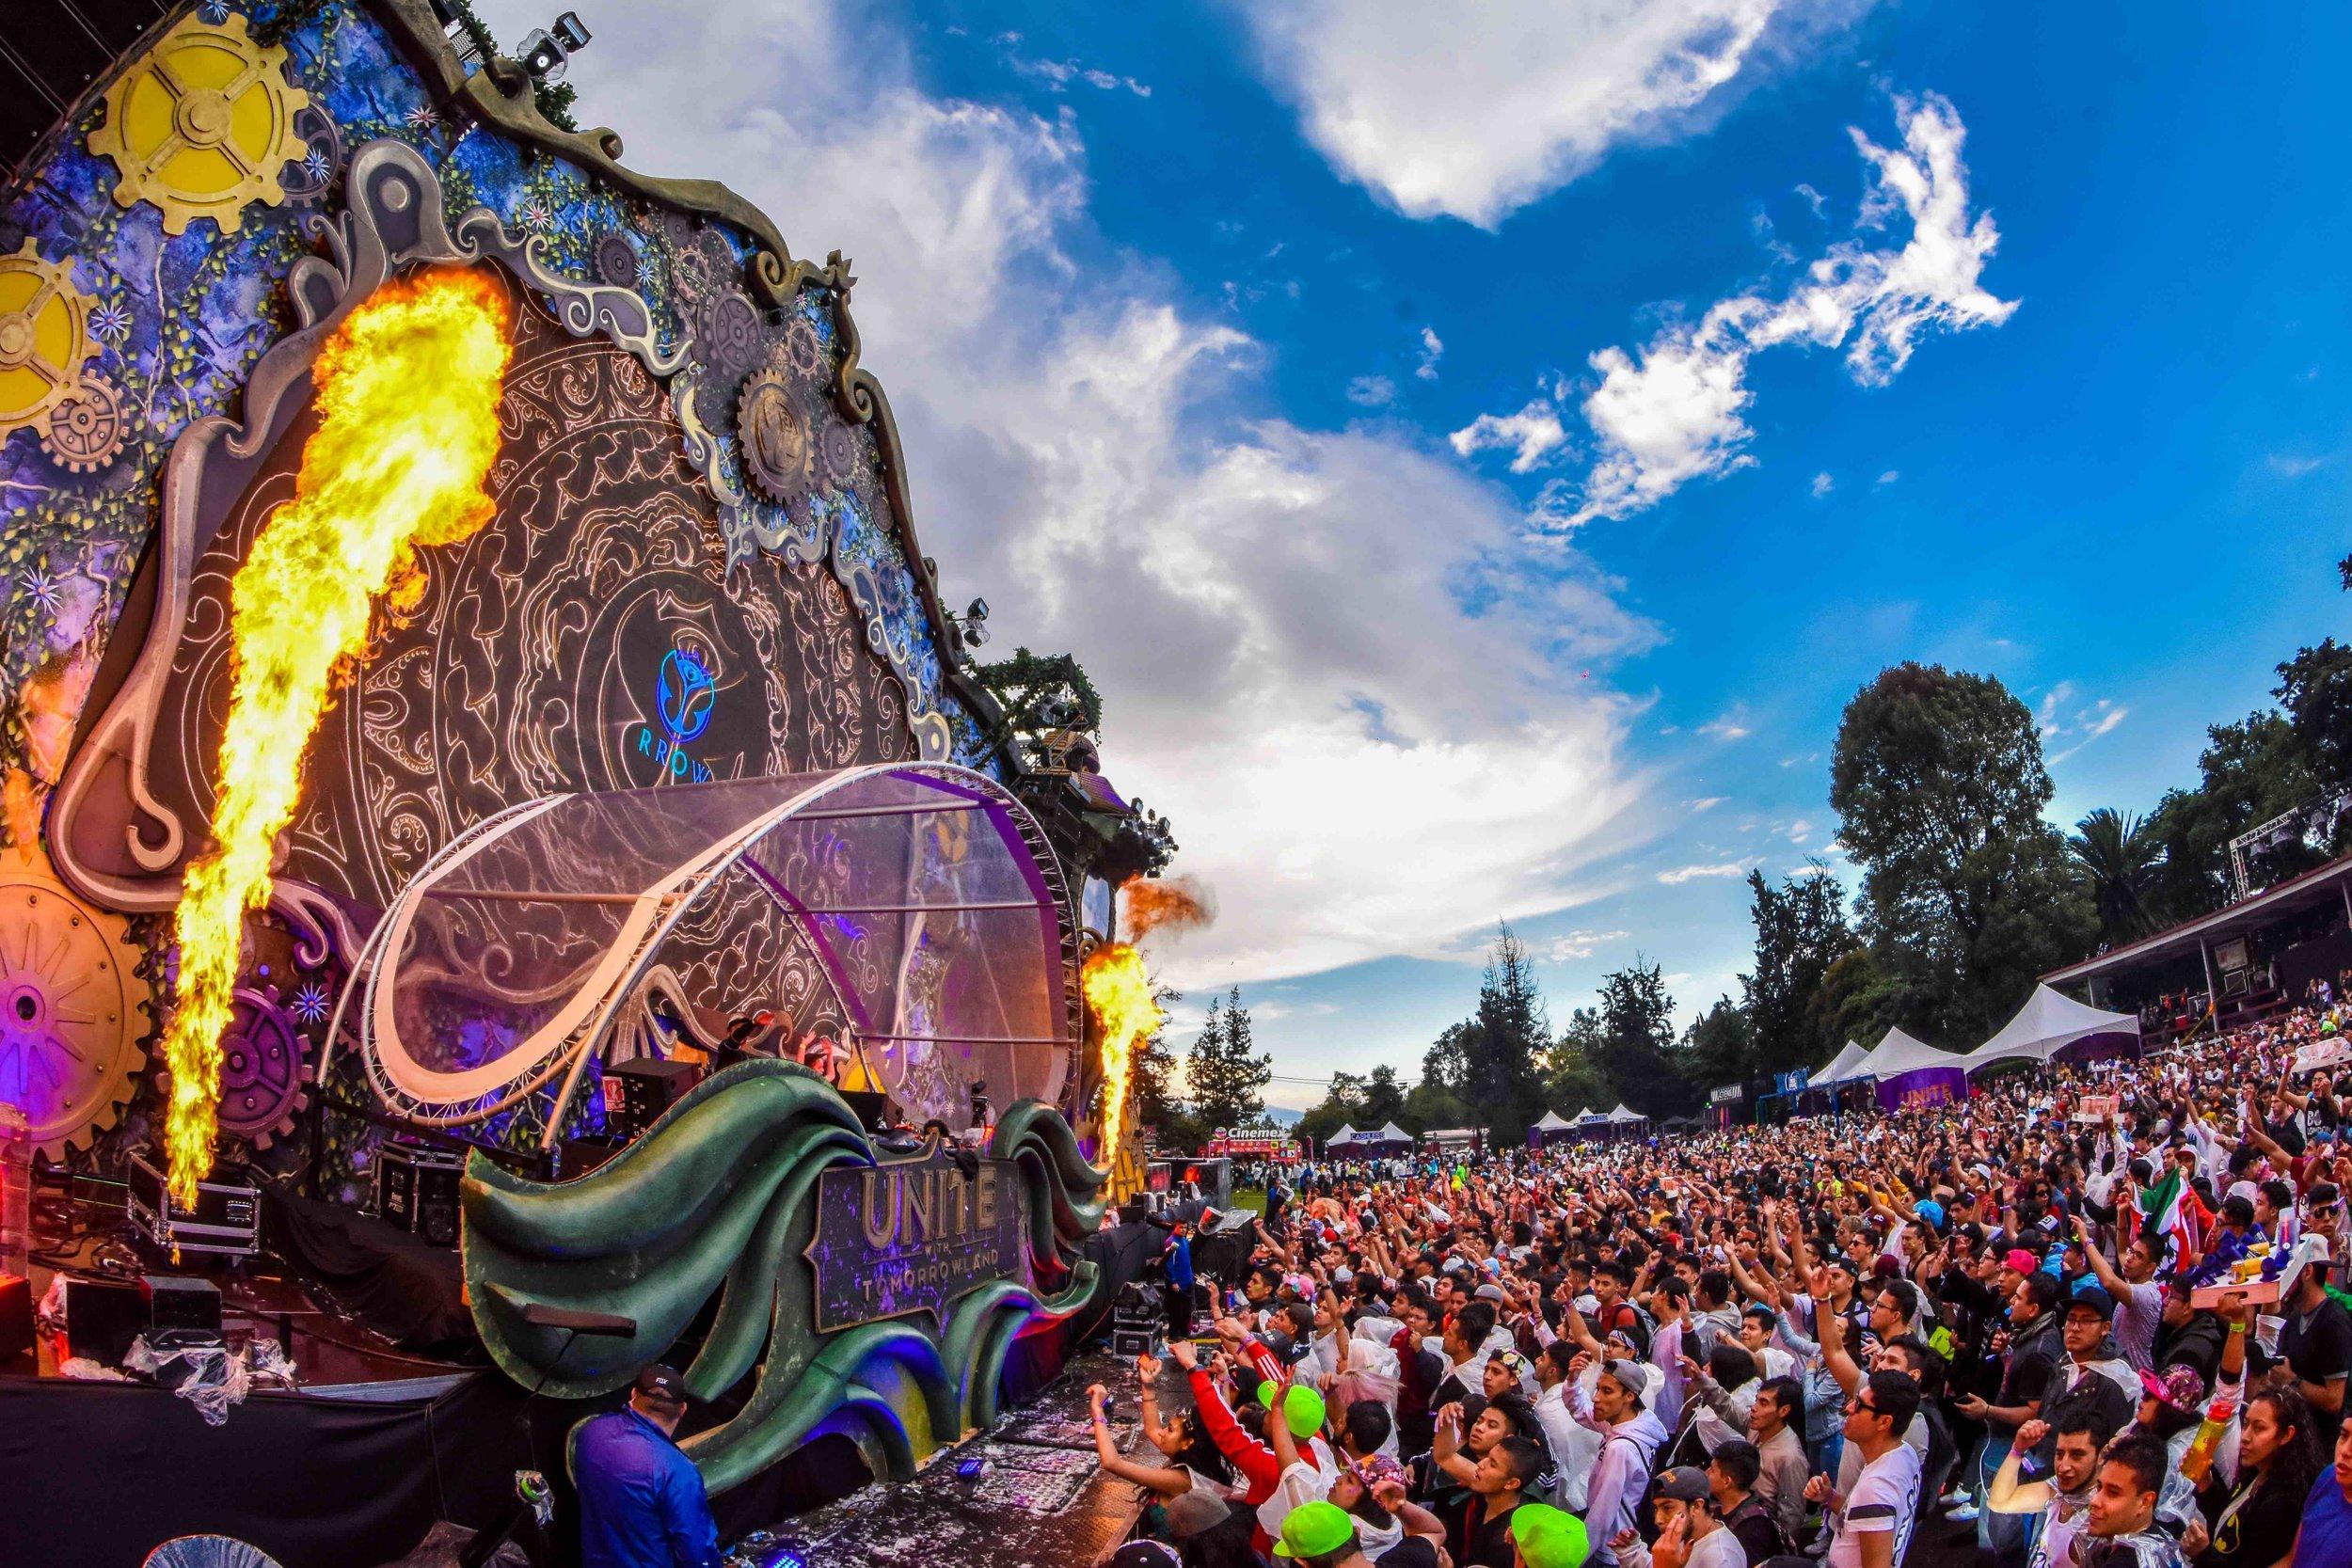 UNITE with Tomorrowland Mexico 2018